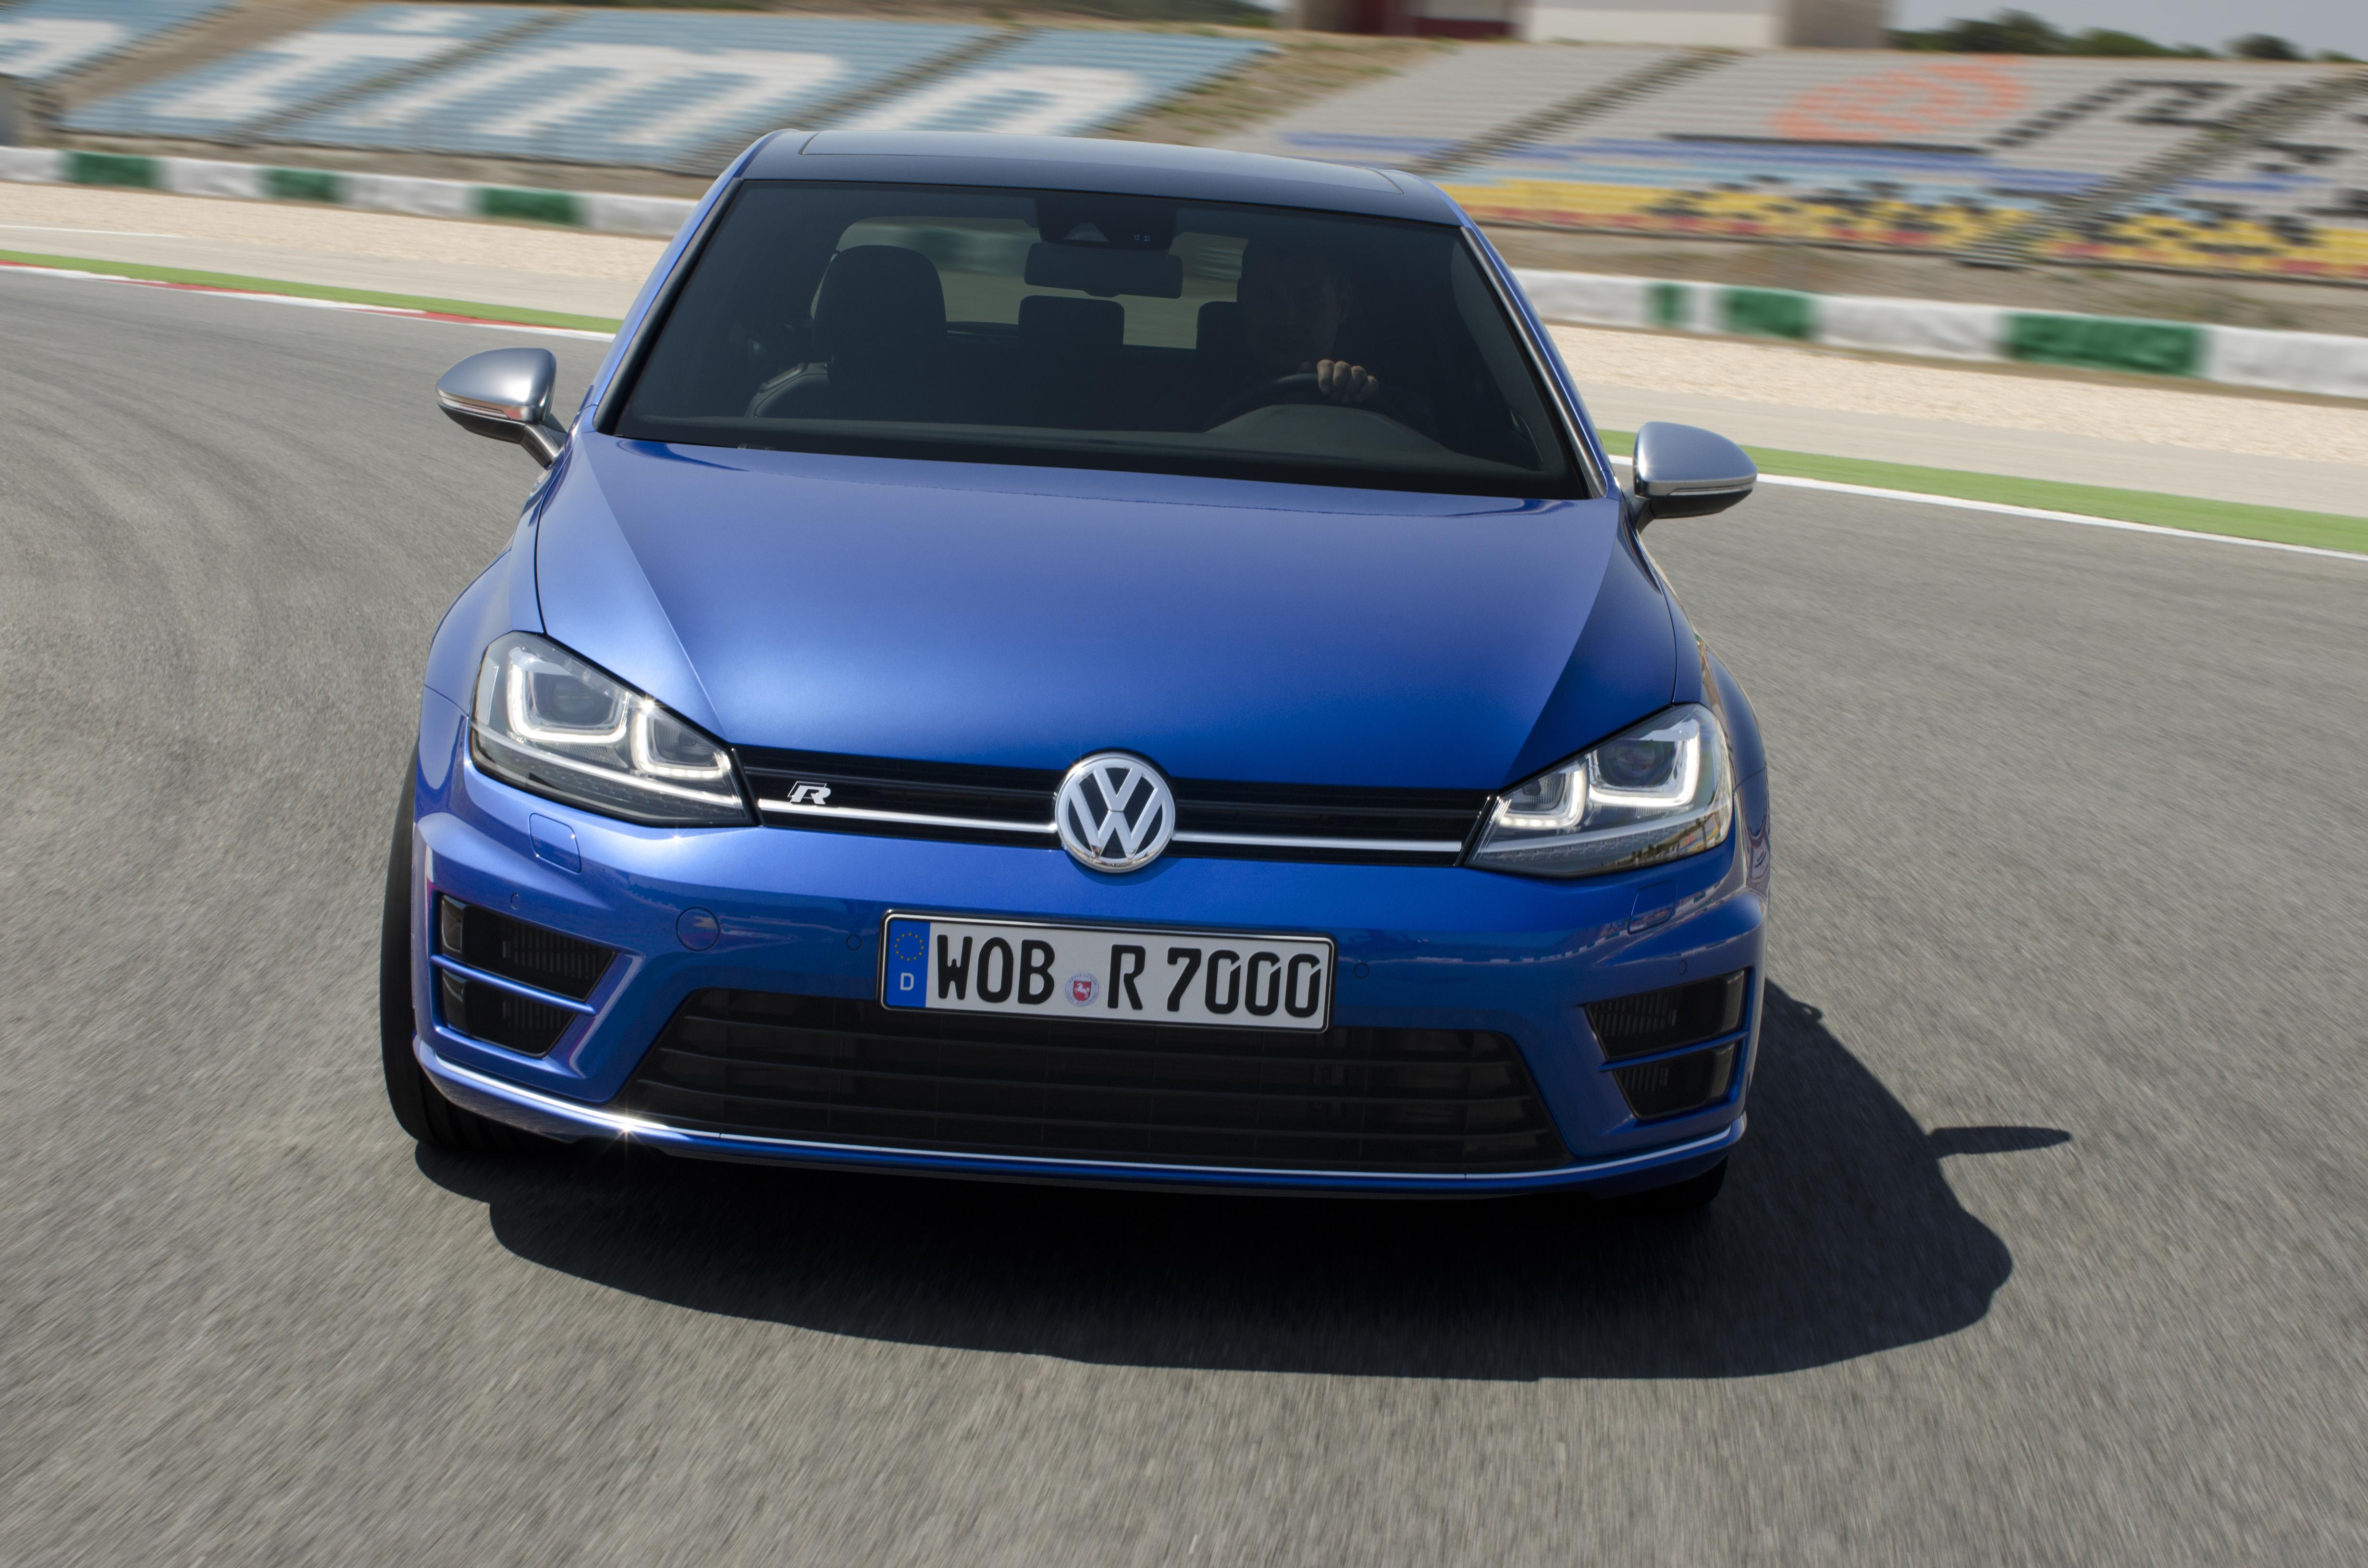 Volkswagen Golf R Mk7 First Details 300 Ps Awd Image 221288